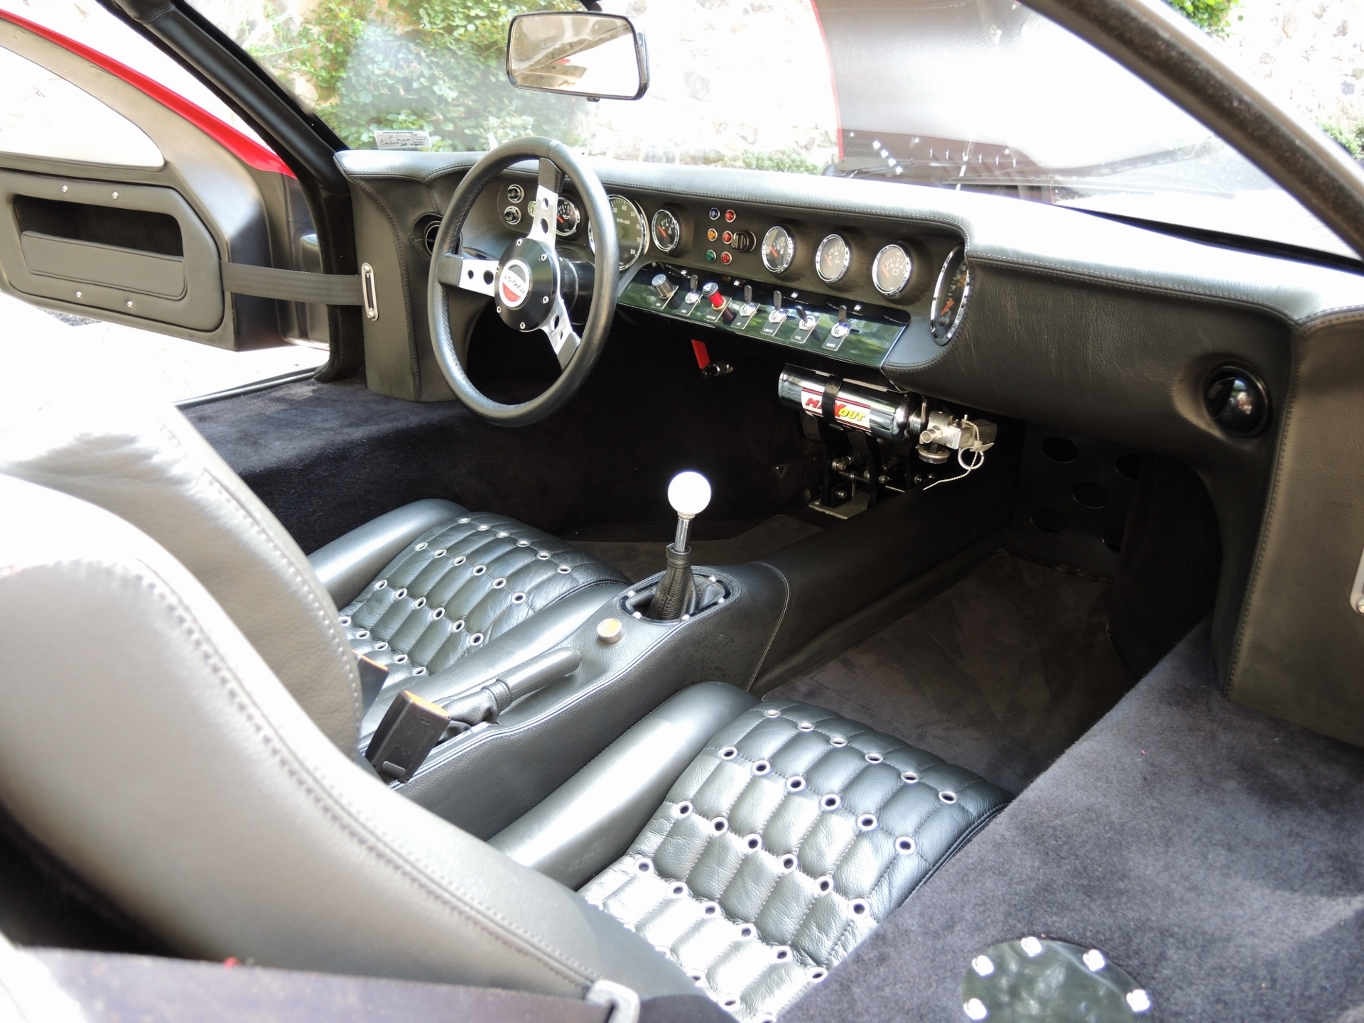 1966 CAV GT For Sale **SOLD**-interior-2-1920x1440-1364x1023-jpg